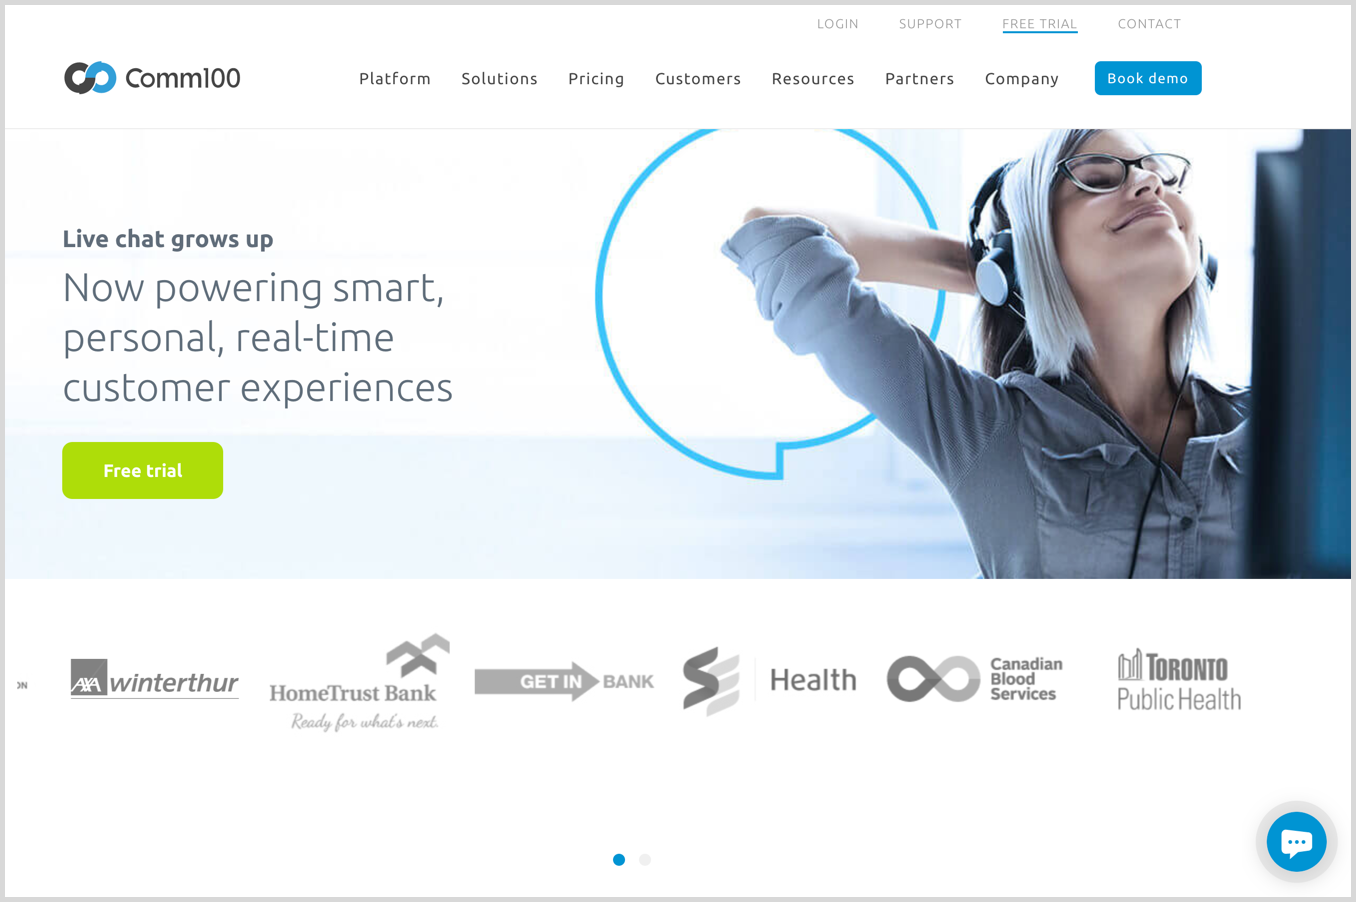 comm100 homepage